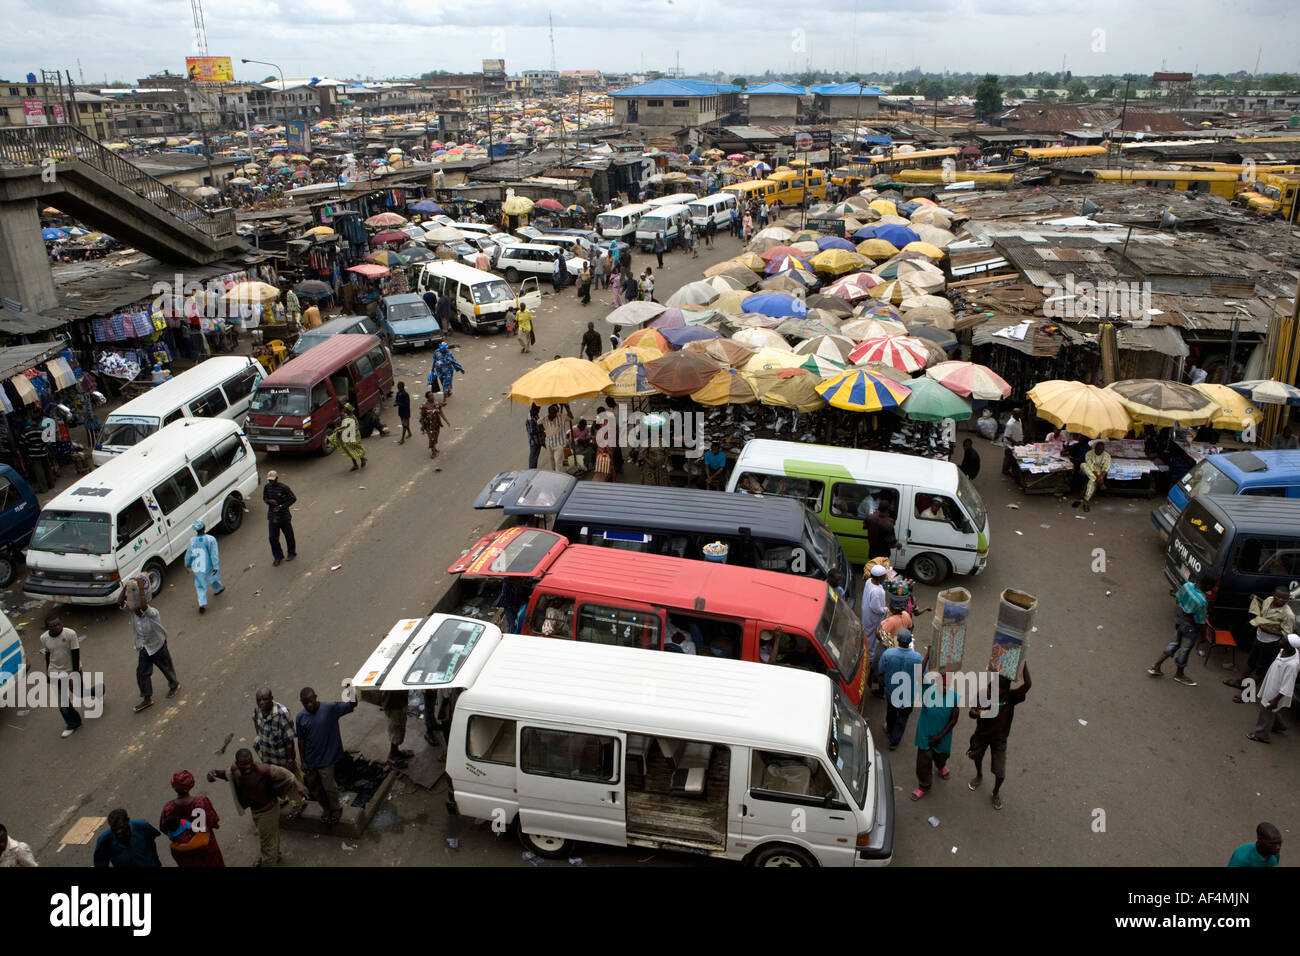 Nigeria Lagos, People at market in Oshidin district - Stock Image